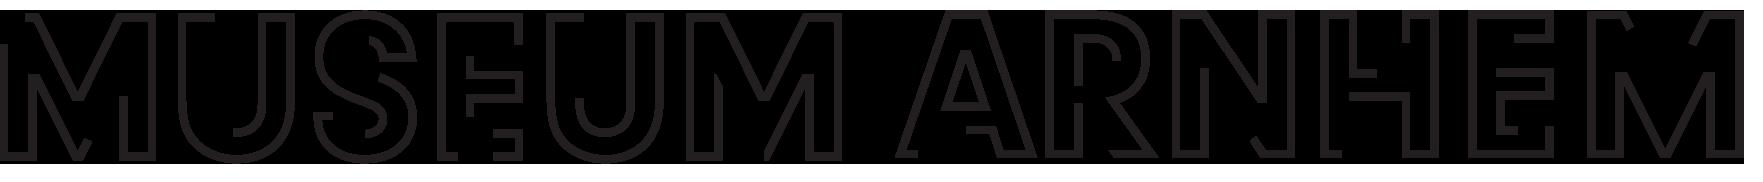 museum-arnhem-logo.png